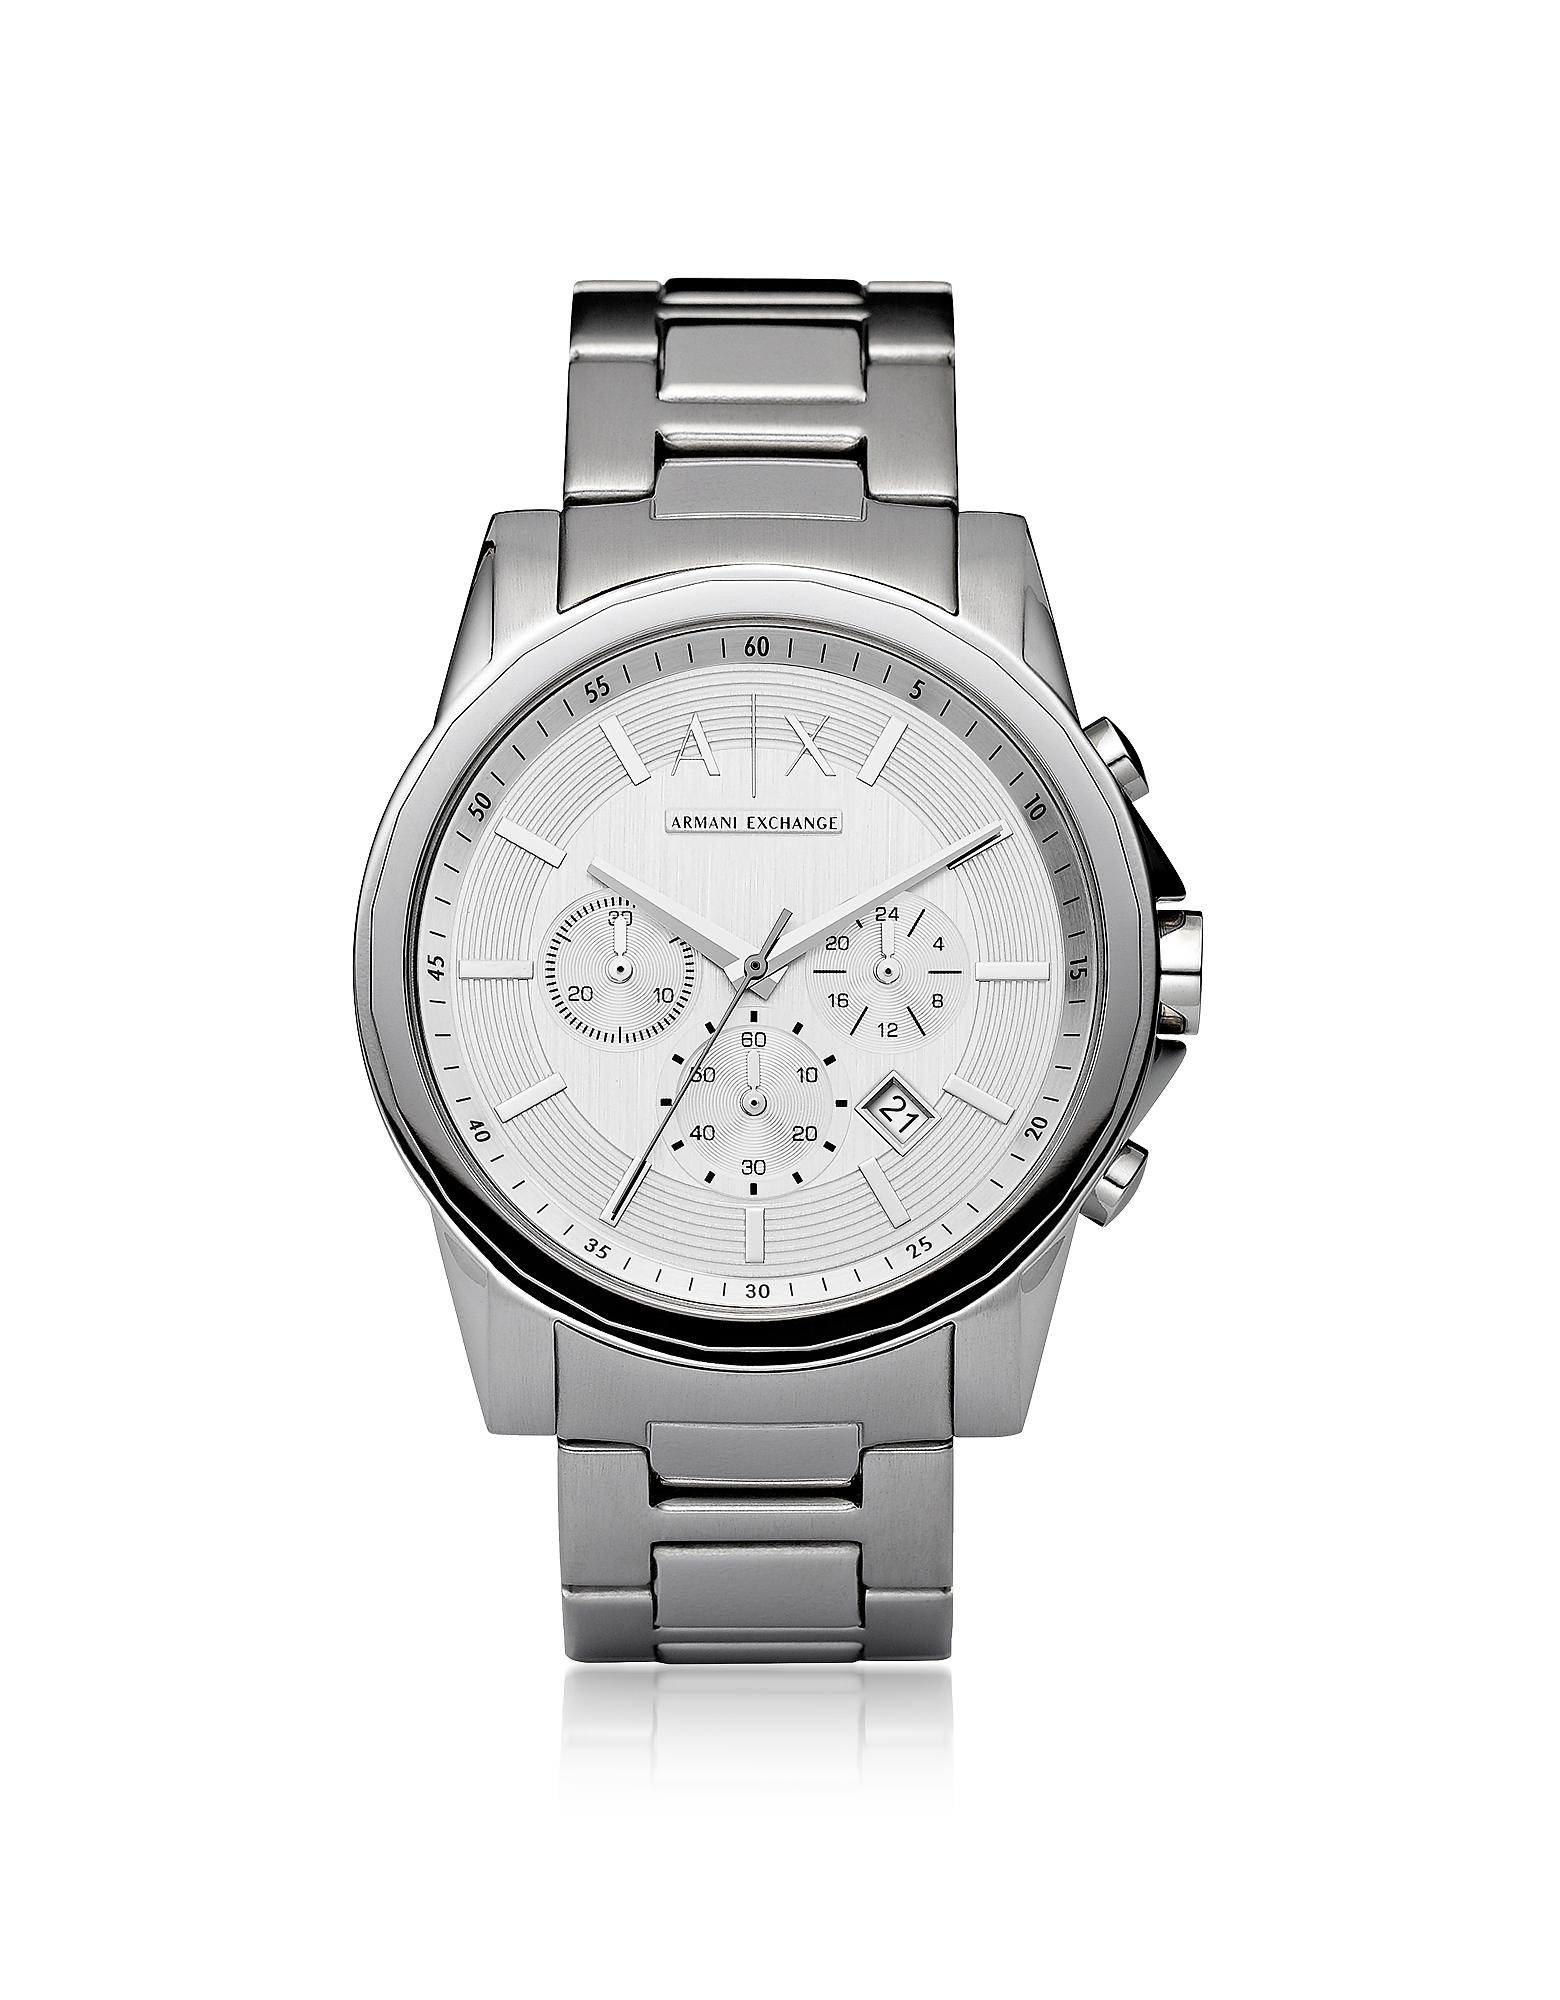 AX2058 - Мужские Часы Outerbanks Emporio Armani